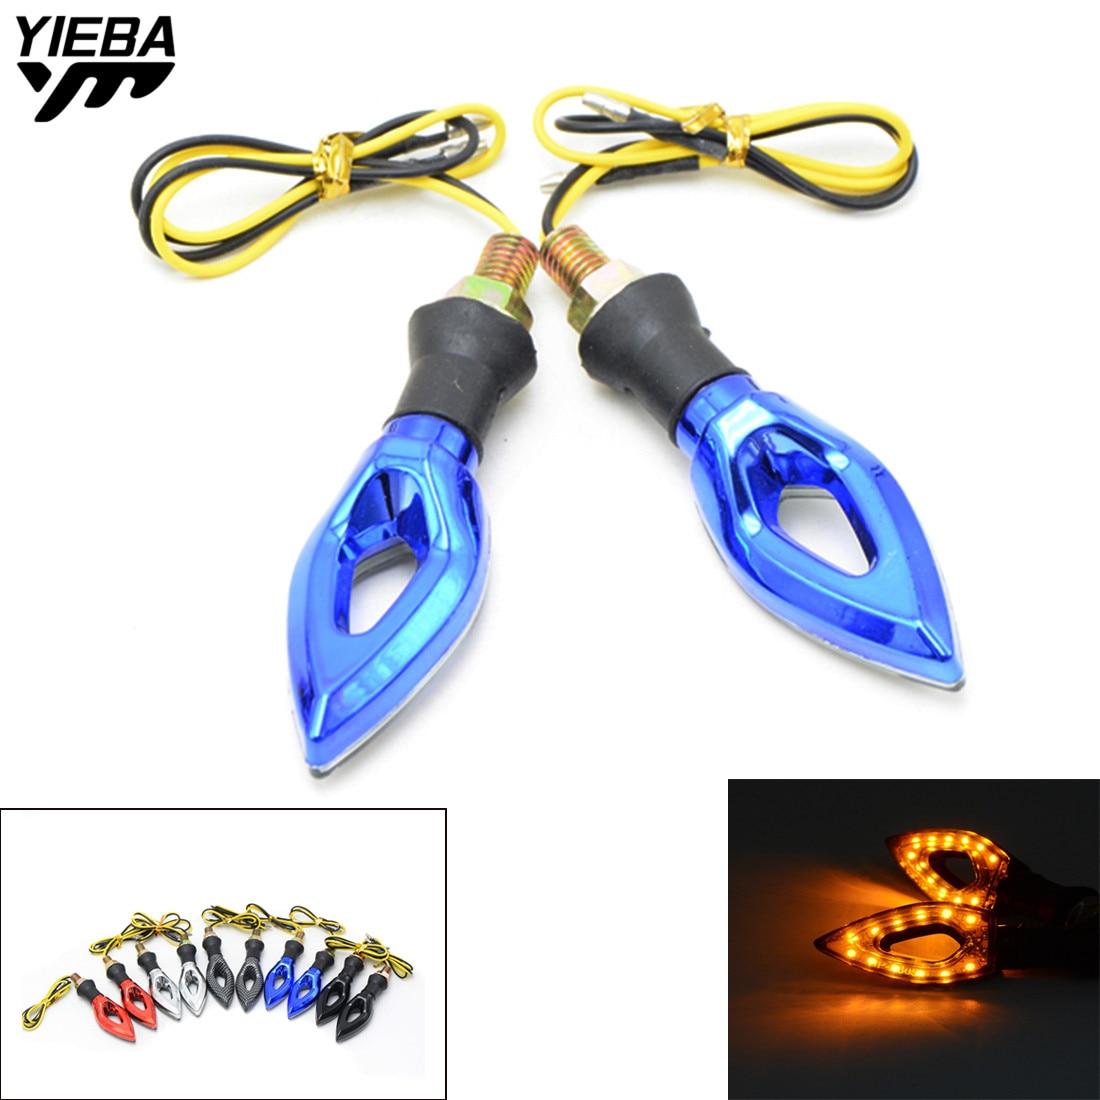 Universal 12V LED Motorcycle Turn Signal Indicators Lights/Lamp FOR YAMAHA YZF-R15 YZF600 R1 R6 R6S USA VERSION XJ6 DIVERSION